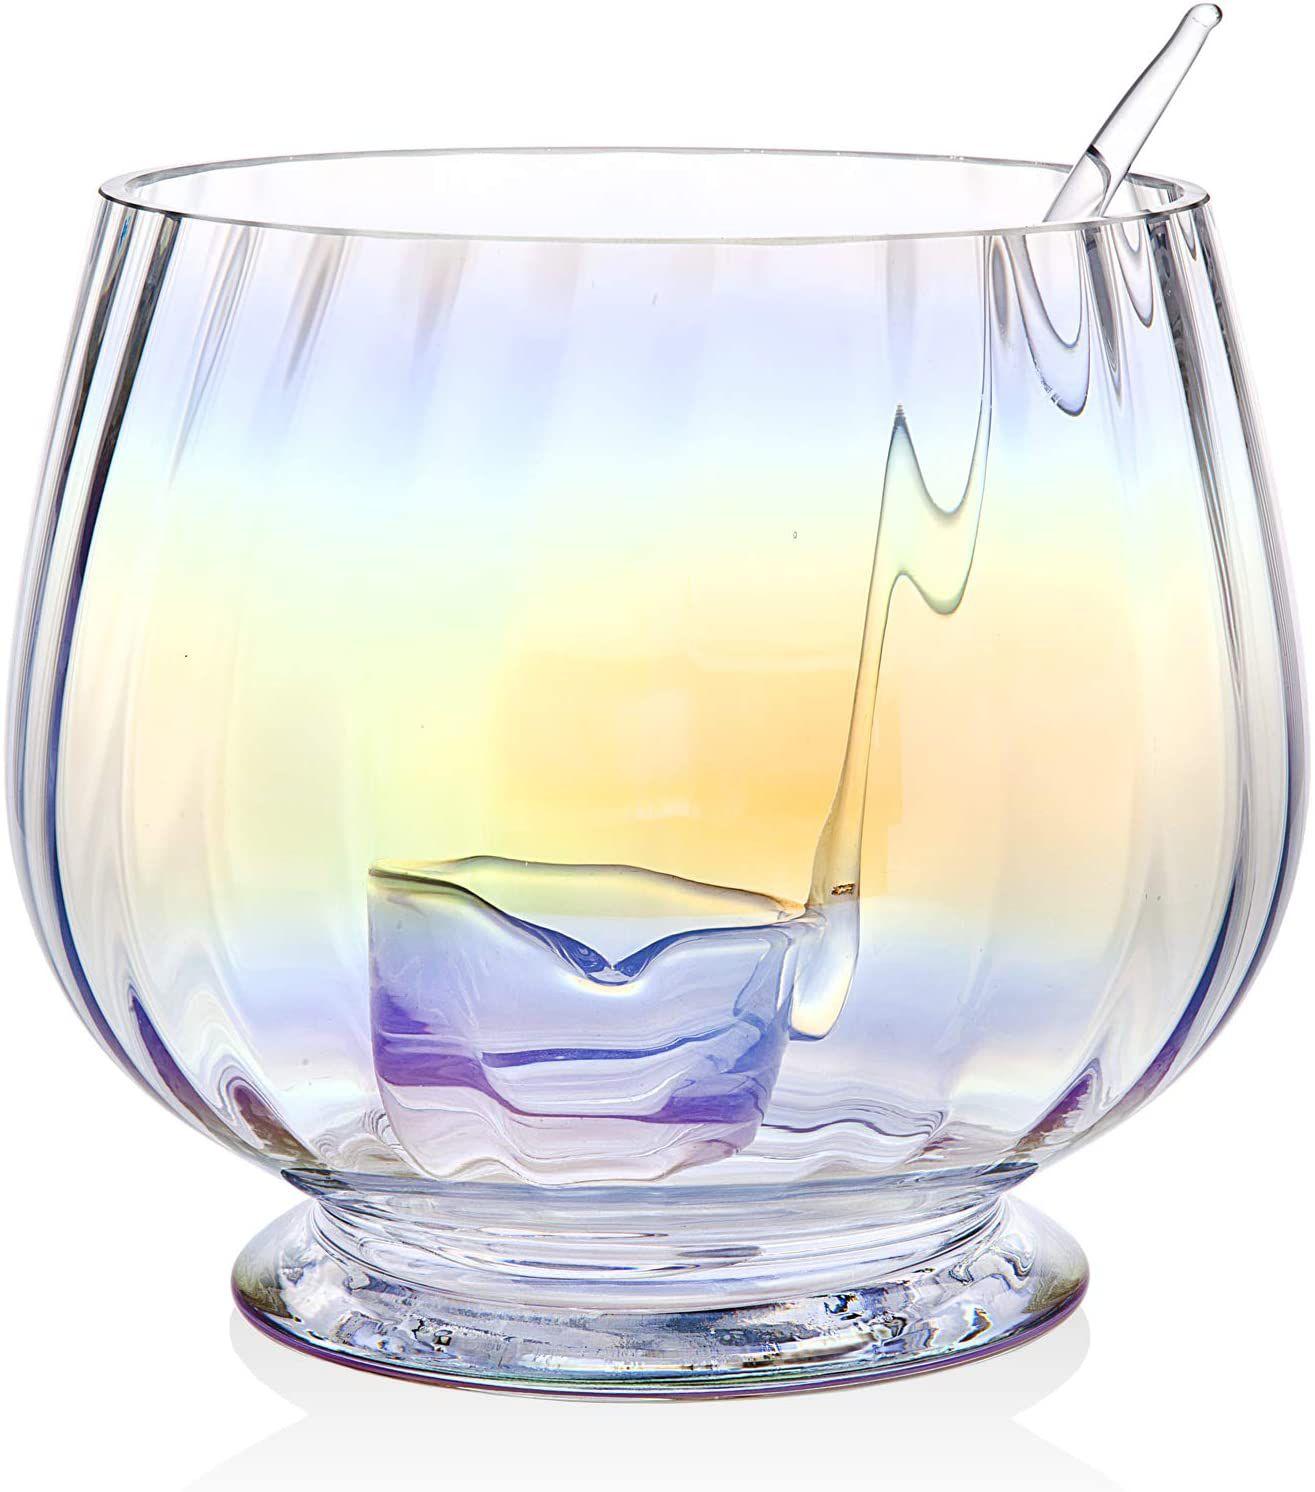 Godinger Monterey Iridescent Punch Bowl & Ladle Set